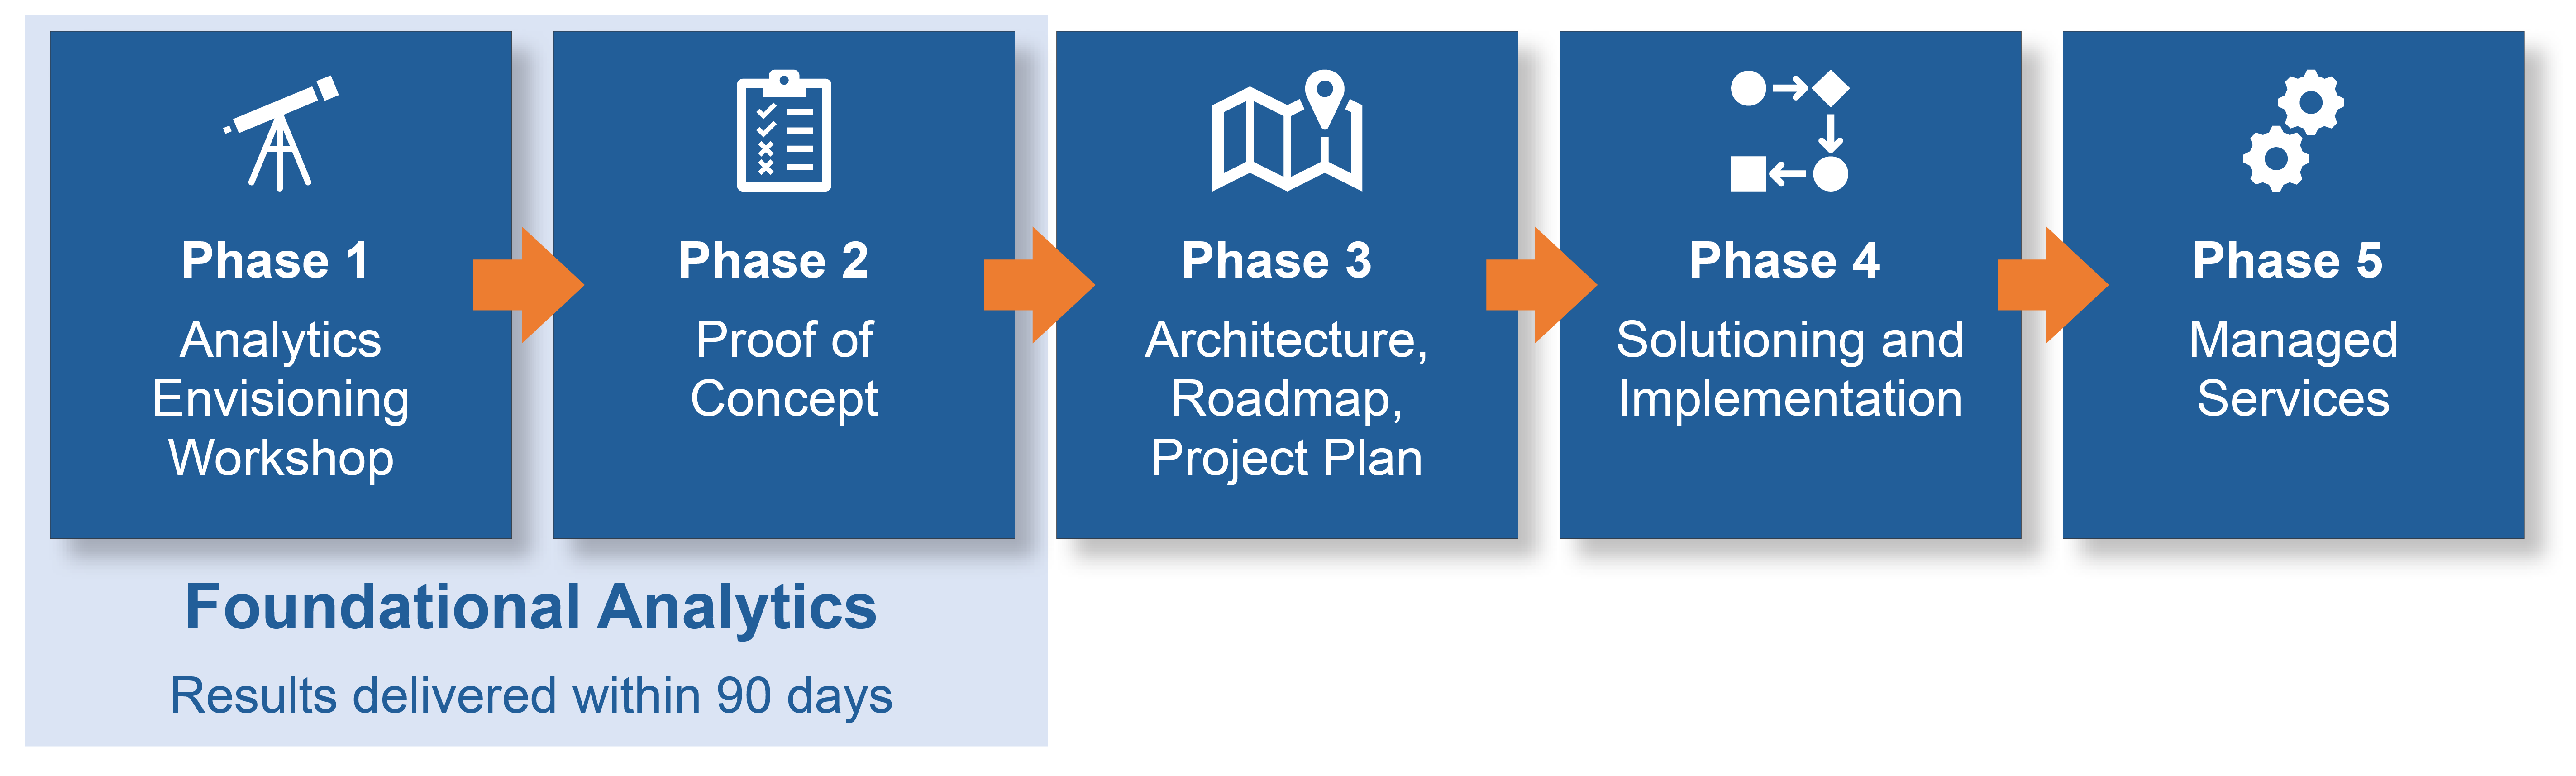 Foundational Analytics Phases